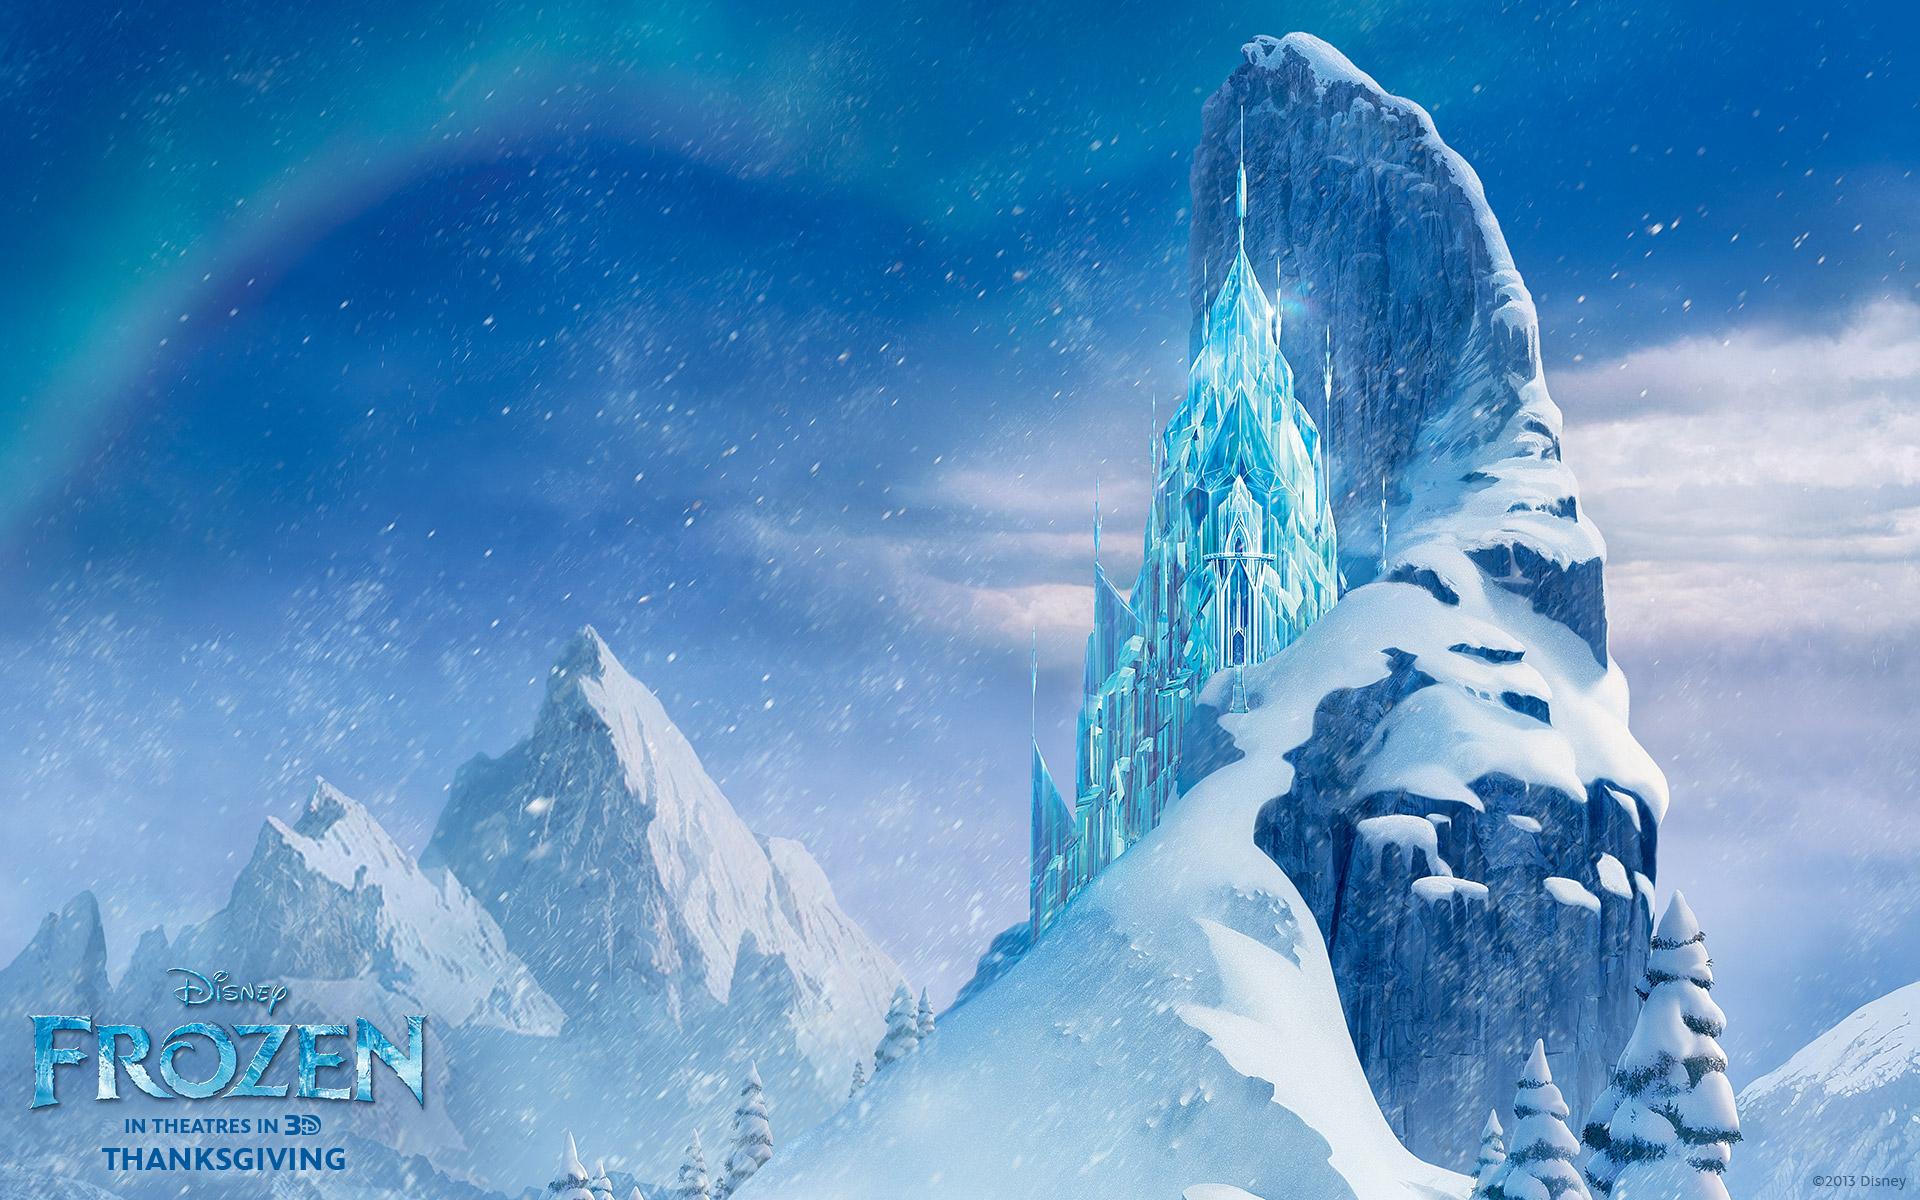 Frozen Disneys Frozen CG animated movie wallpaper image background 1920x1200